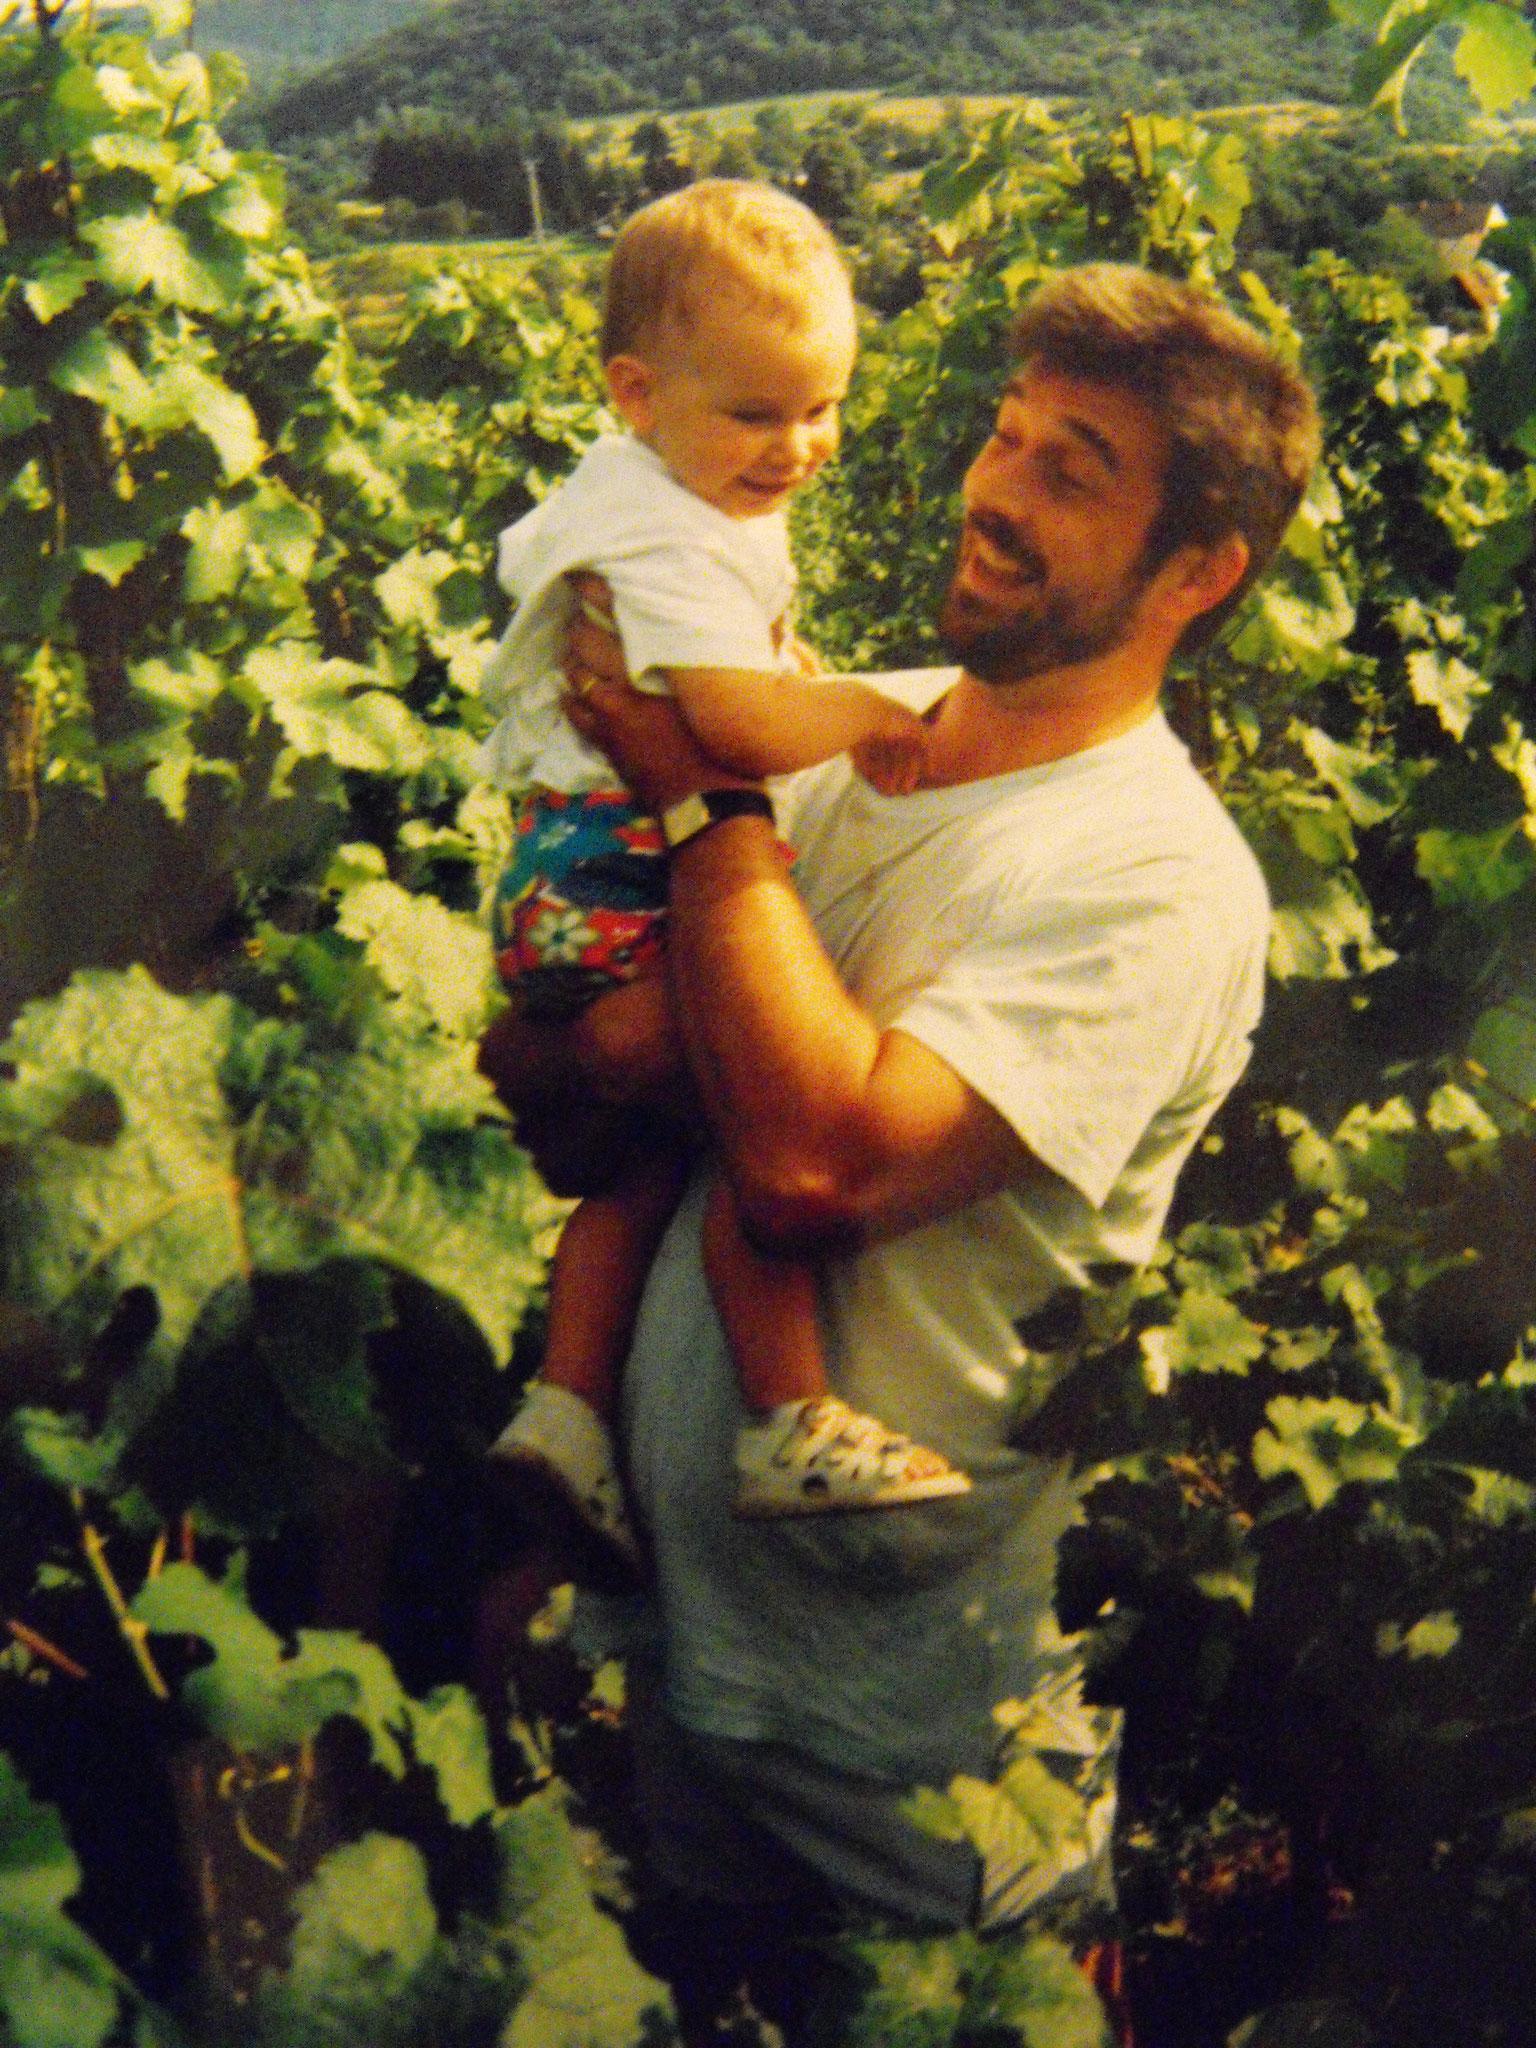 Roots senior und Roots junior